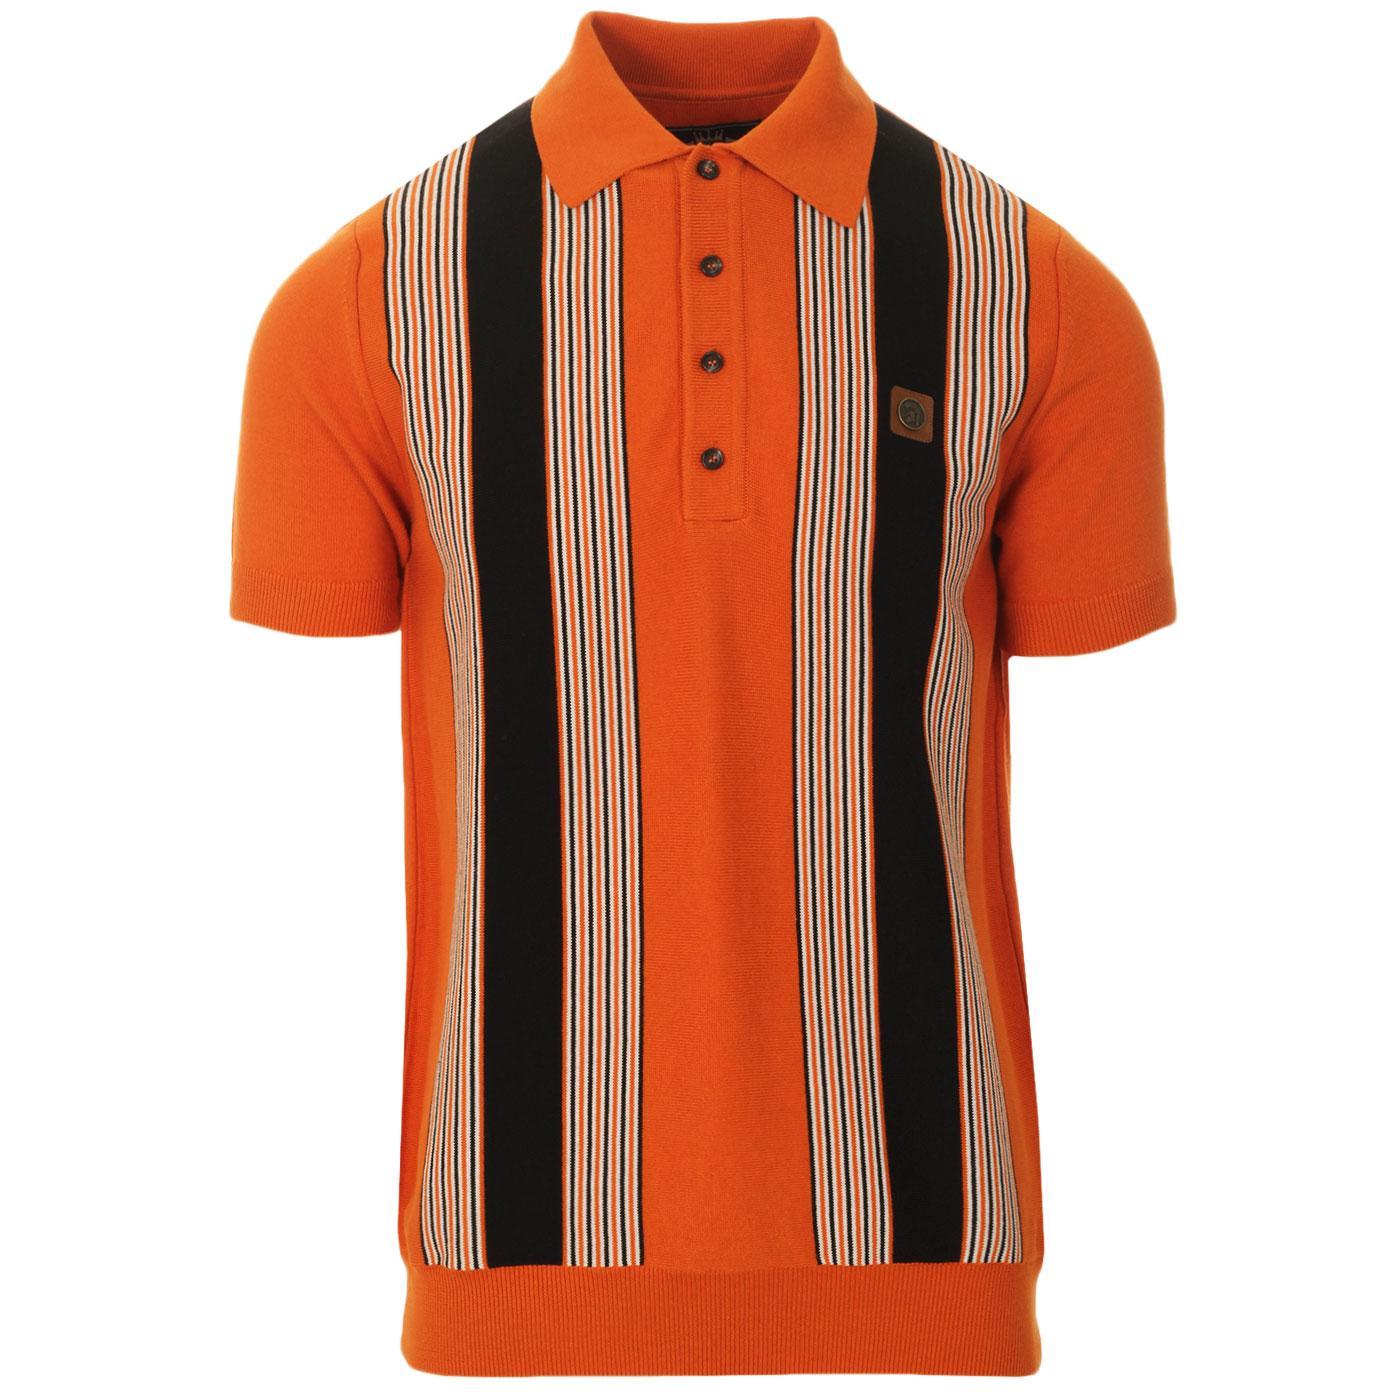 TROJAN RECORDS Ska Mod Stripe Knit Polo (Orange)